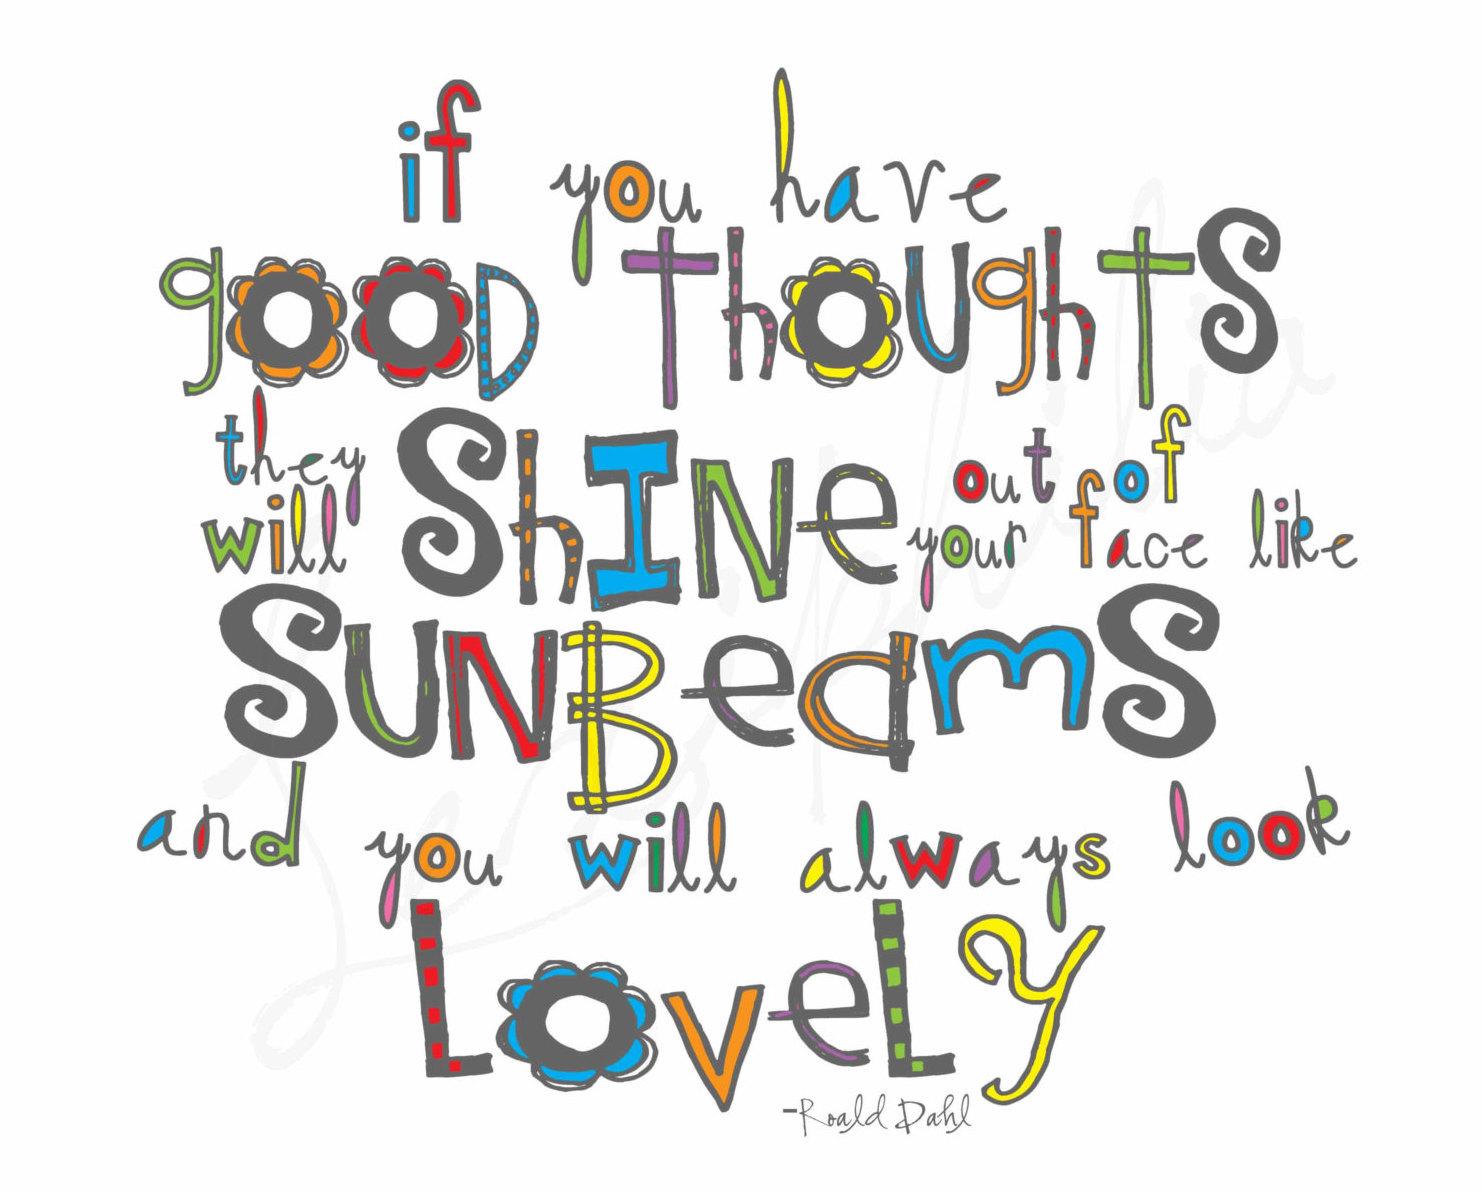 Matilda Roald Dahl Good Thoughts Sunbeam Quote Sign Etsy